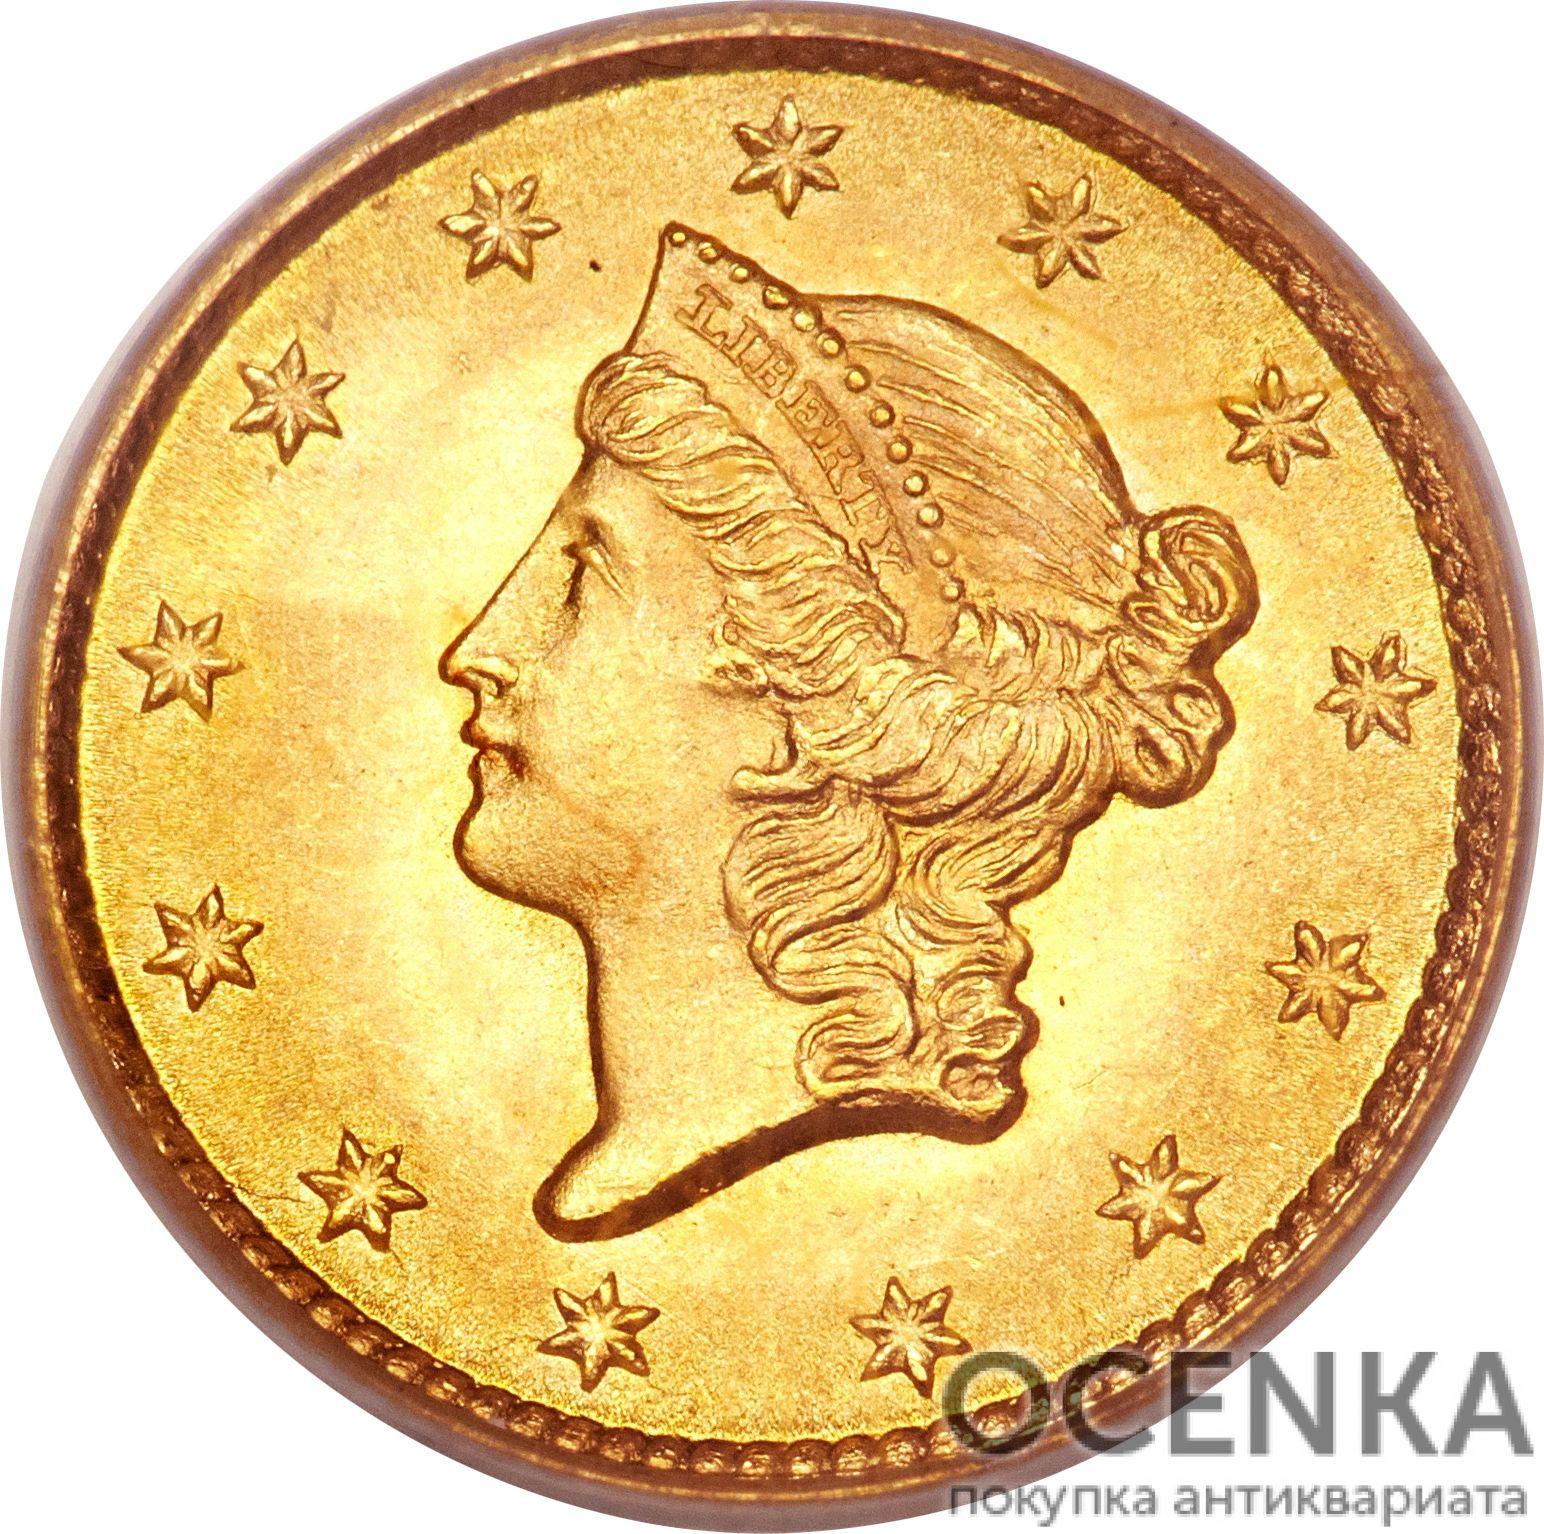 Золотая монета 1 Dollar (доллар) США - 1